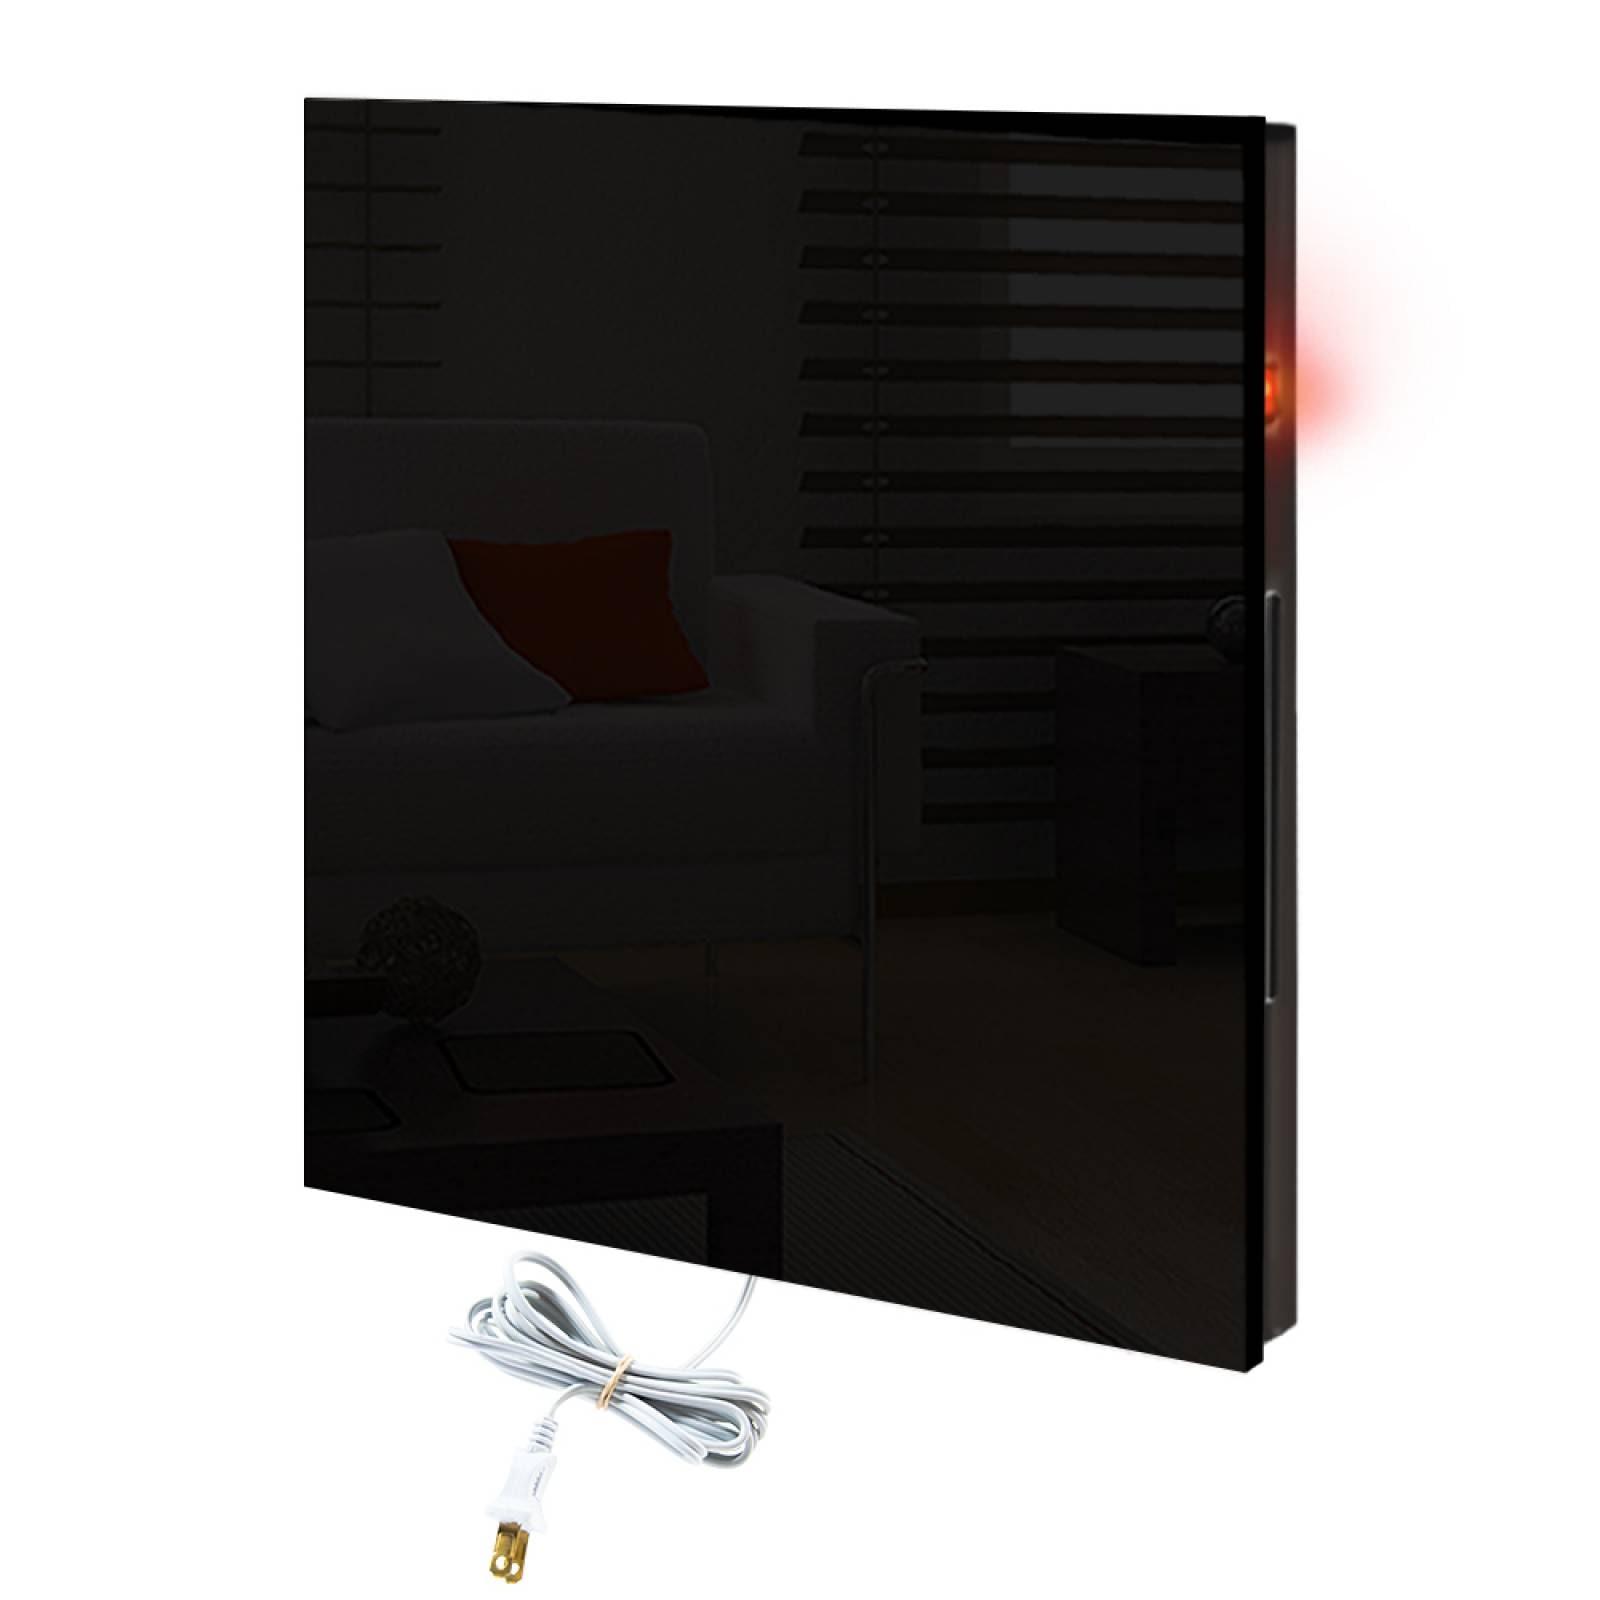 Calefactor de Panel infrarrojo en Cristal para Pared, Miami Wave Black Devil de 380W 60x60cm, Mod: 342CaSol-N